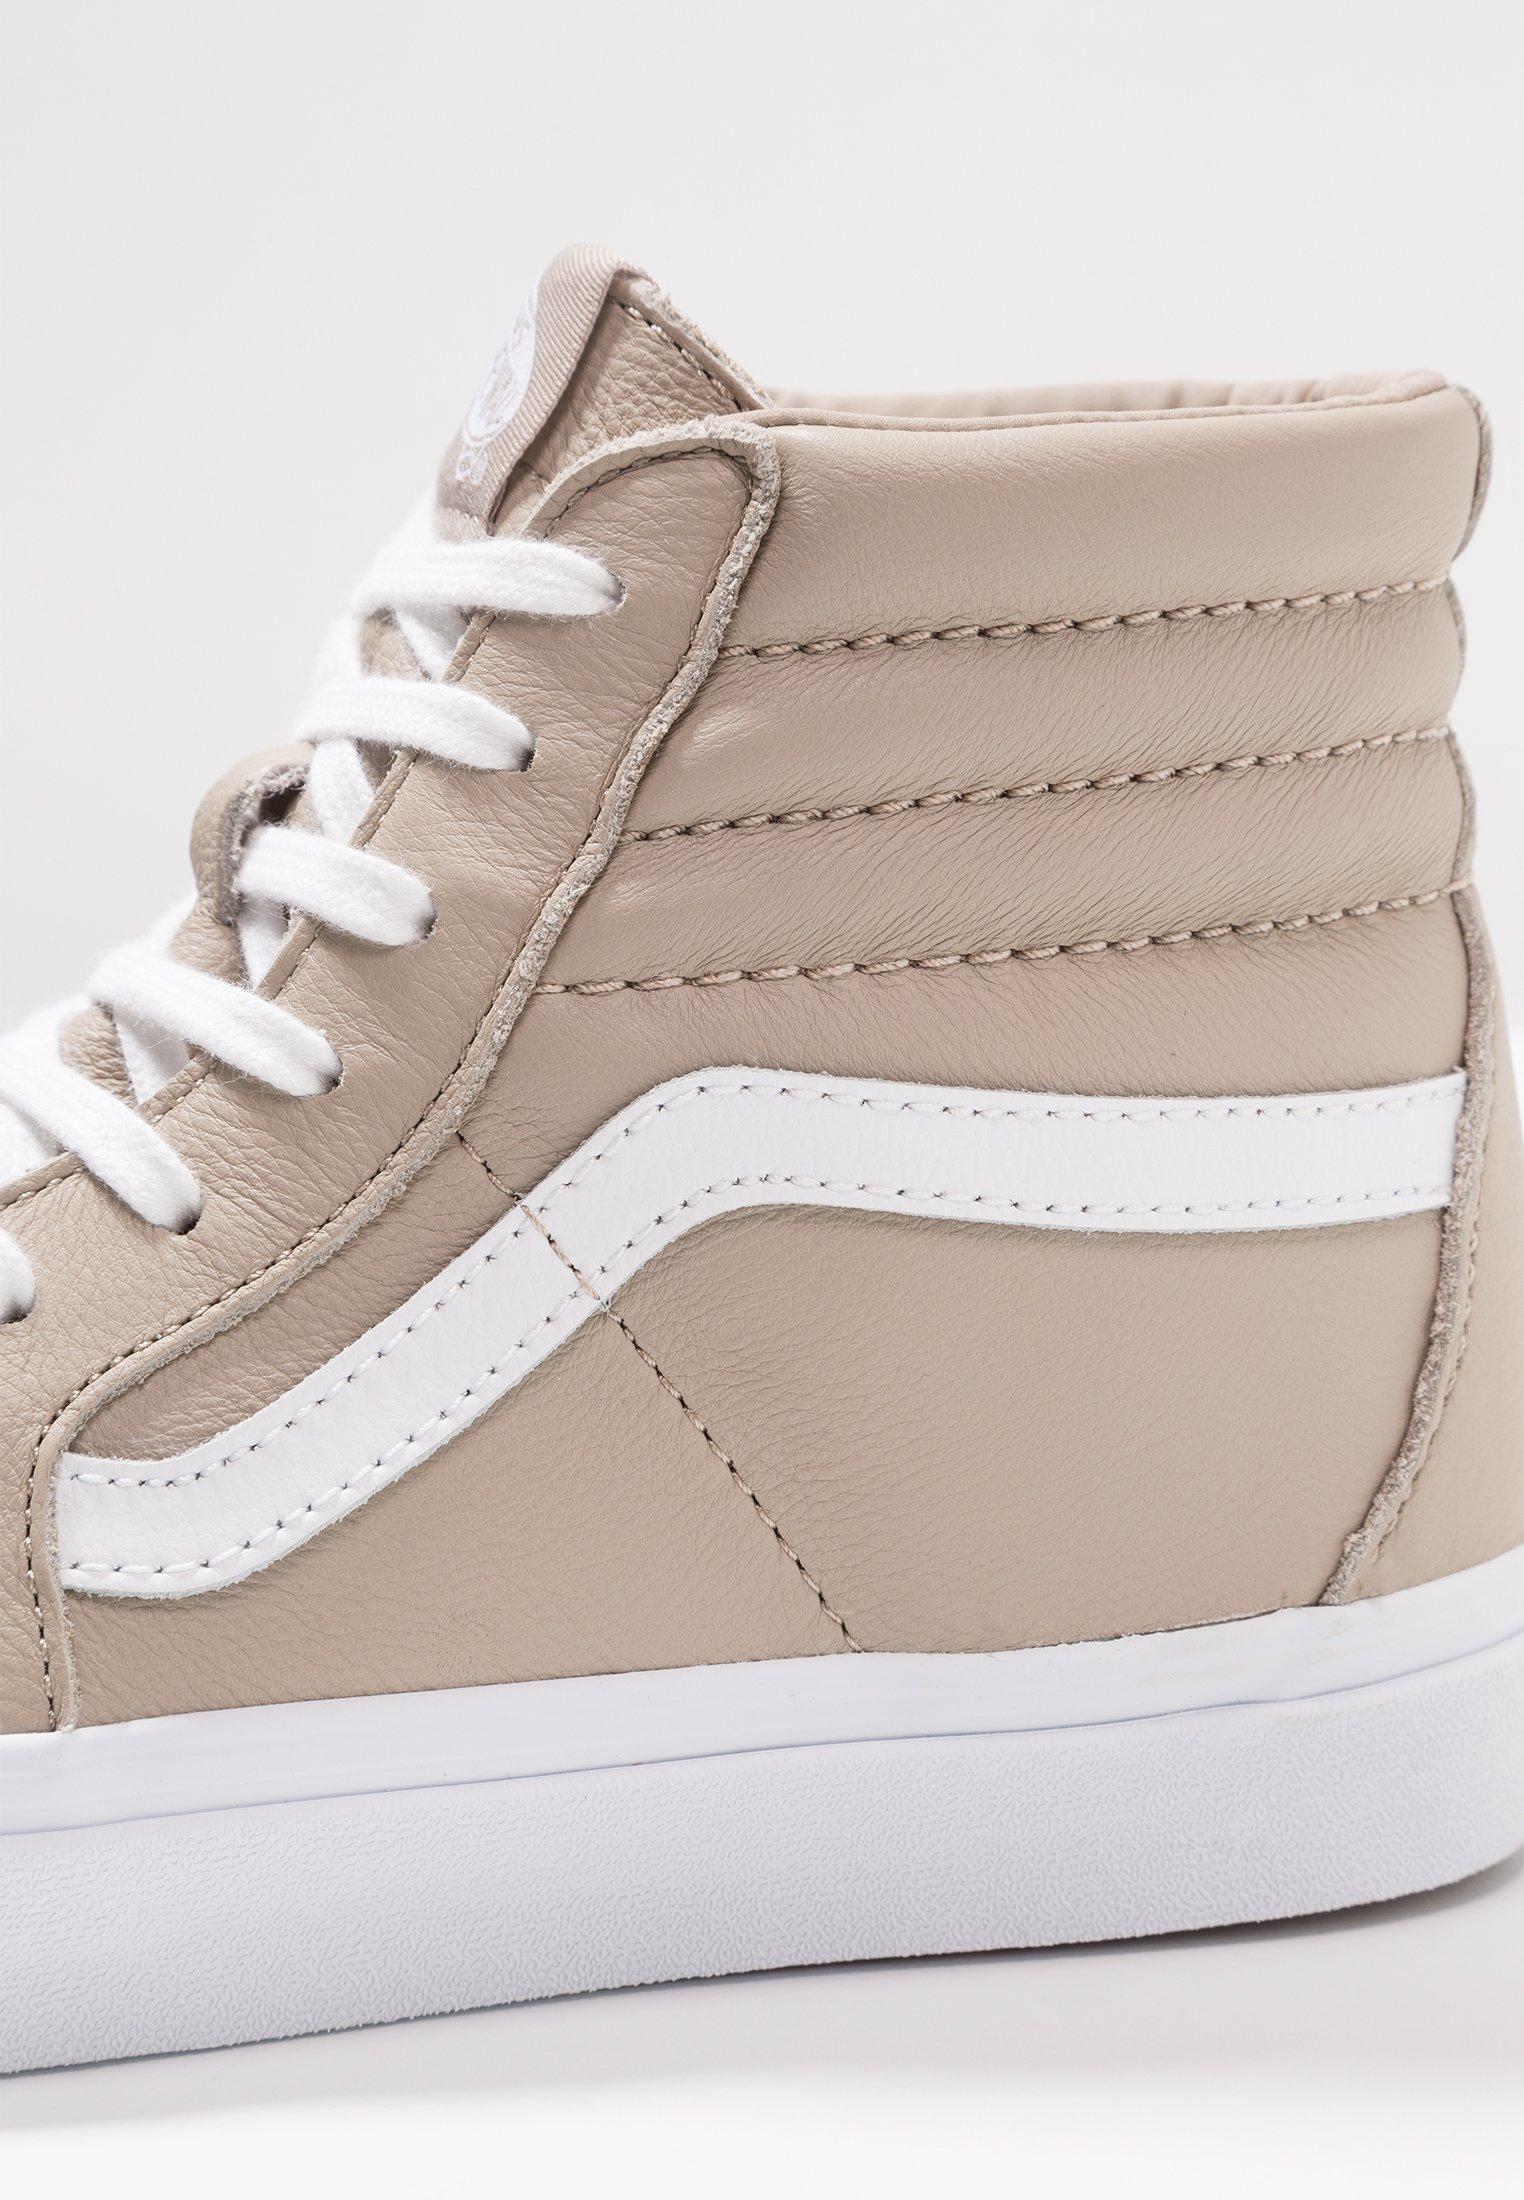 chaussure vans humus